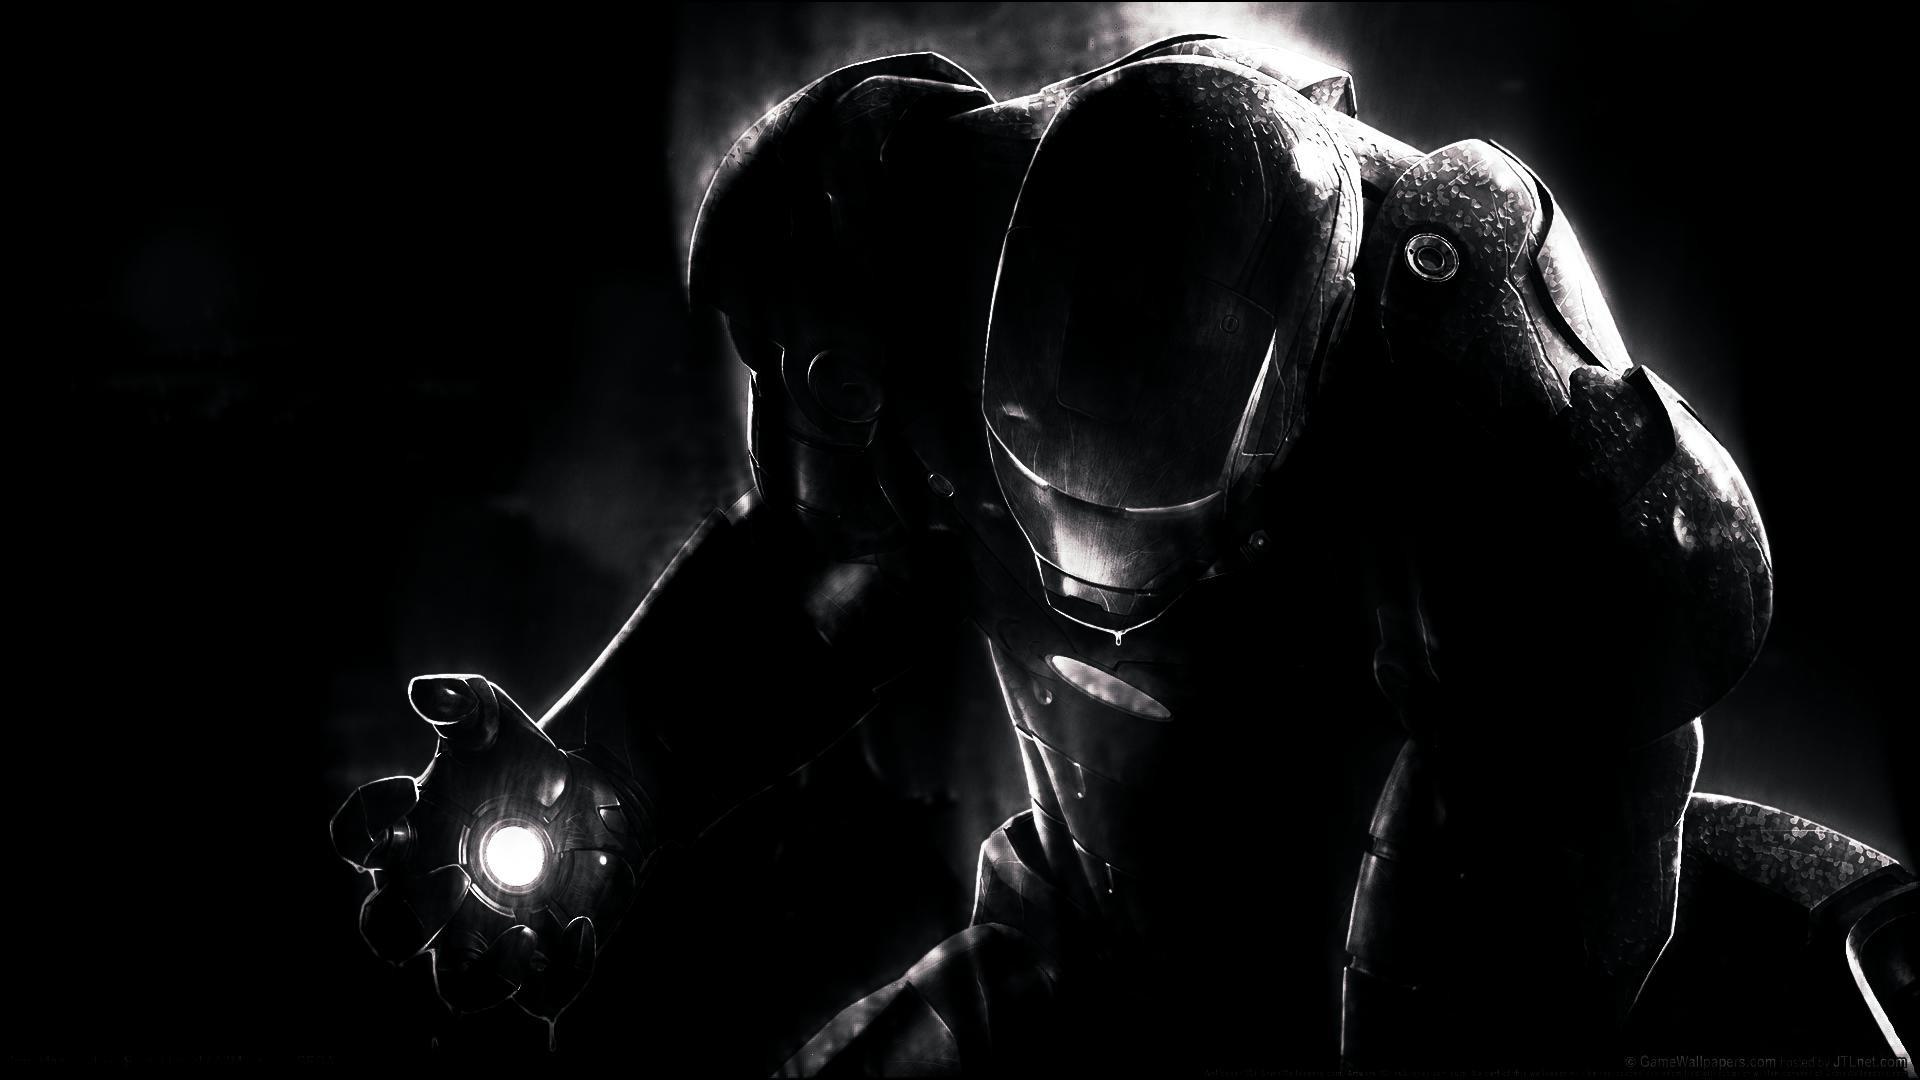 Iron Man Wallpaper HD